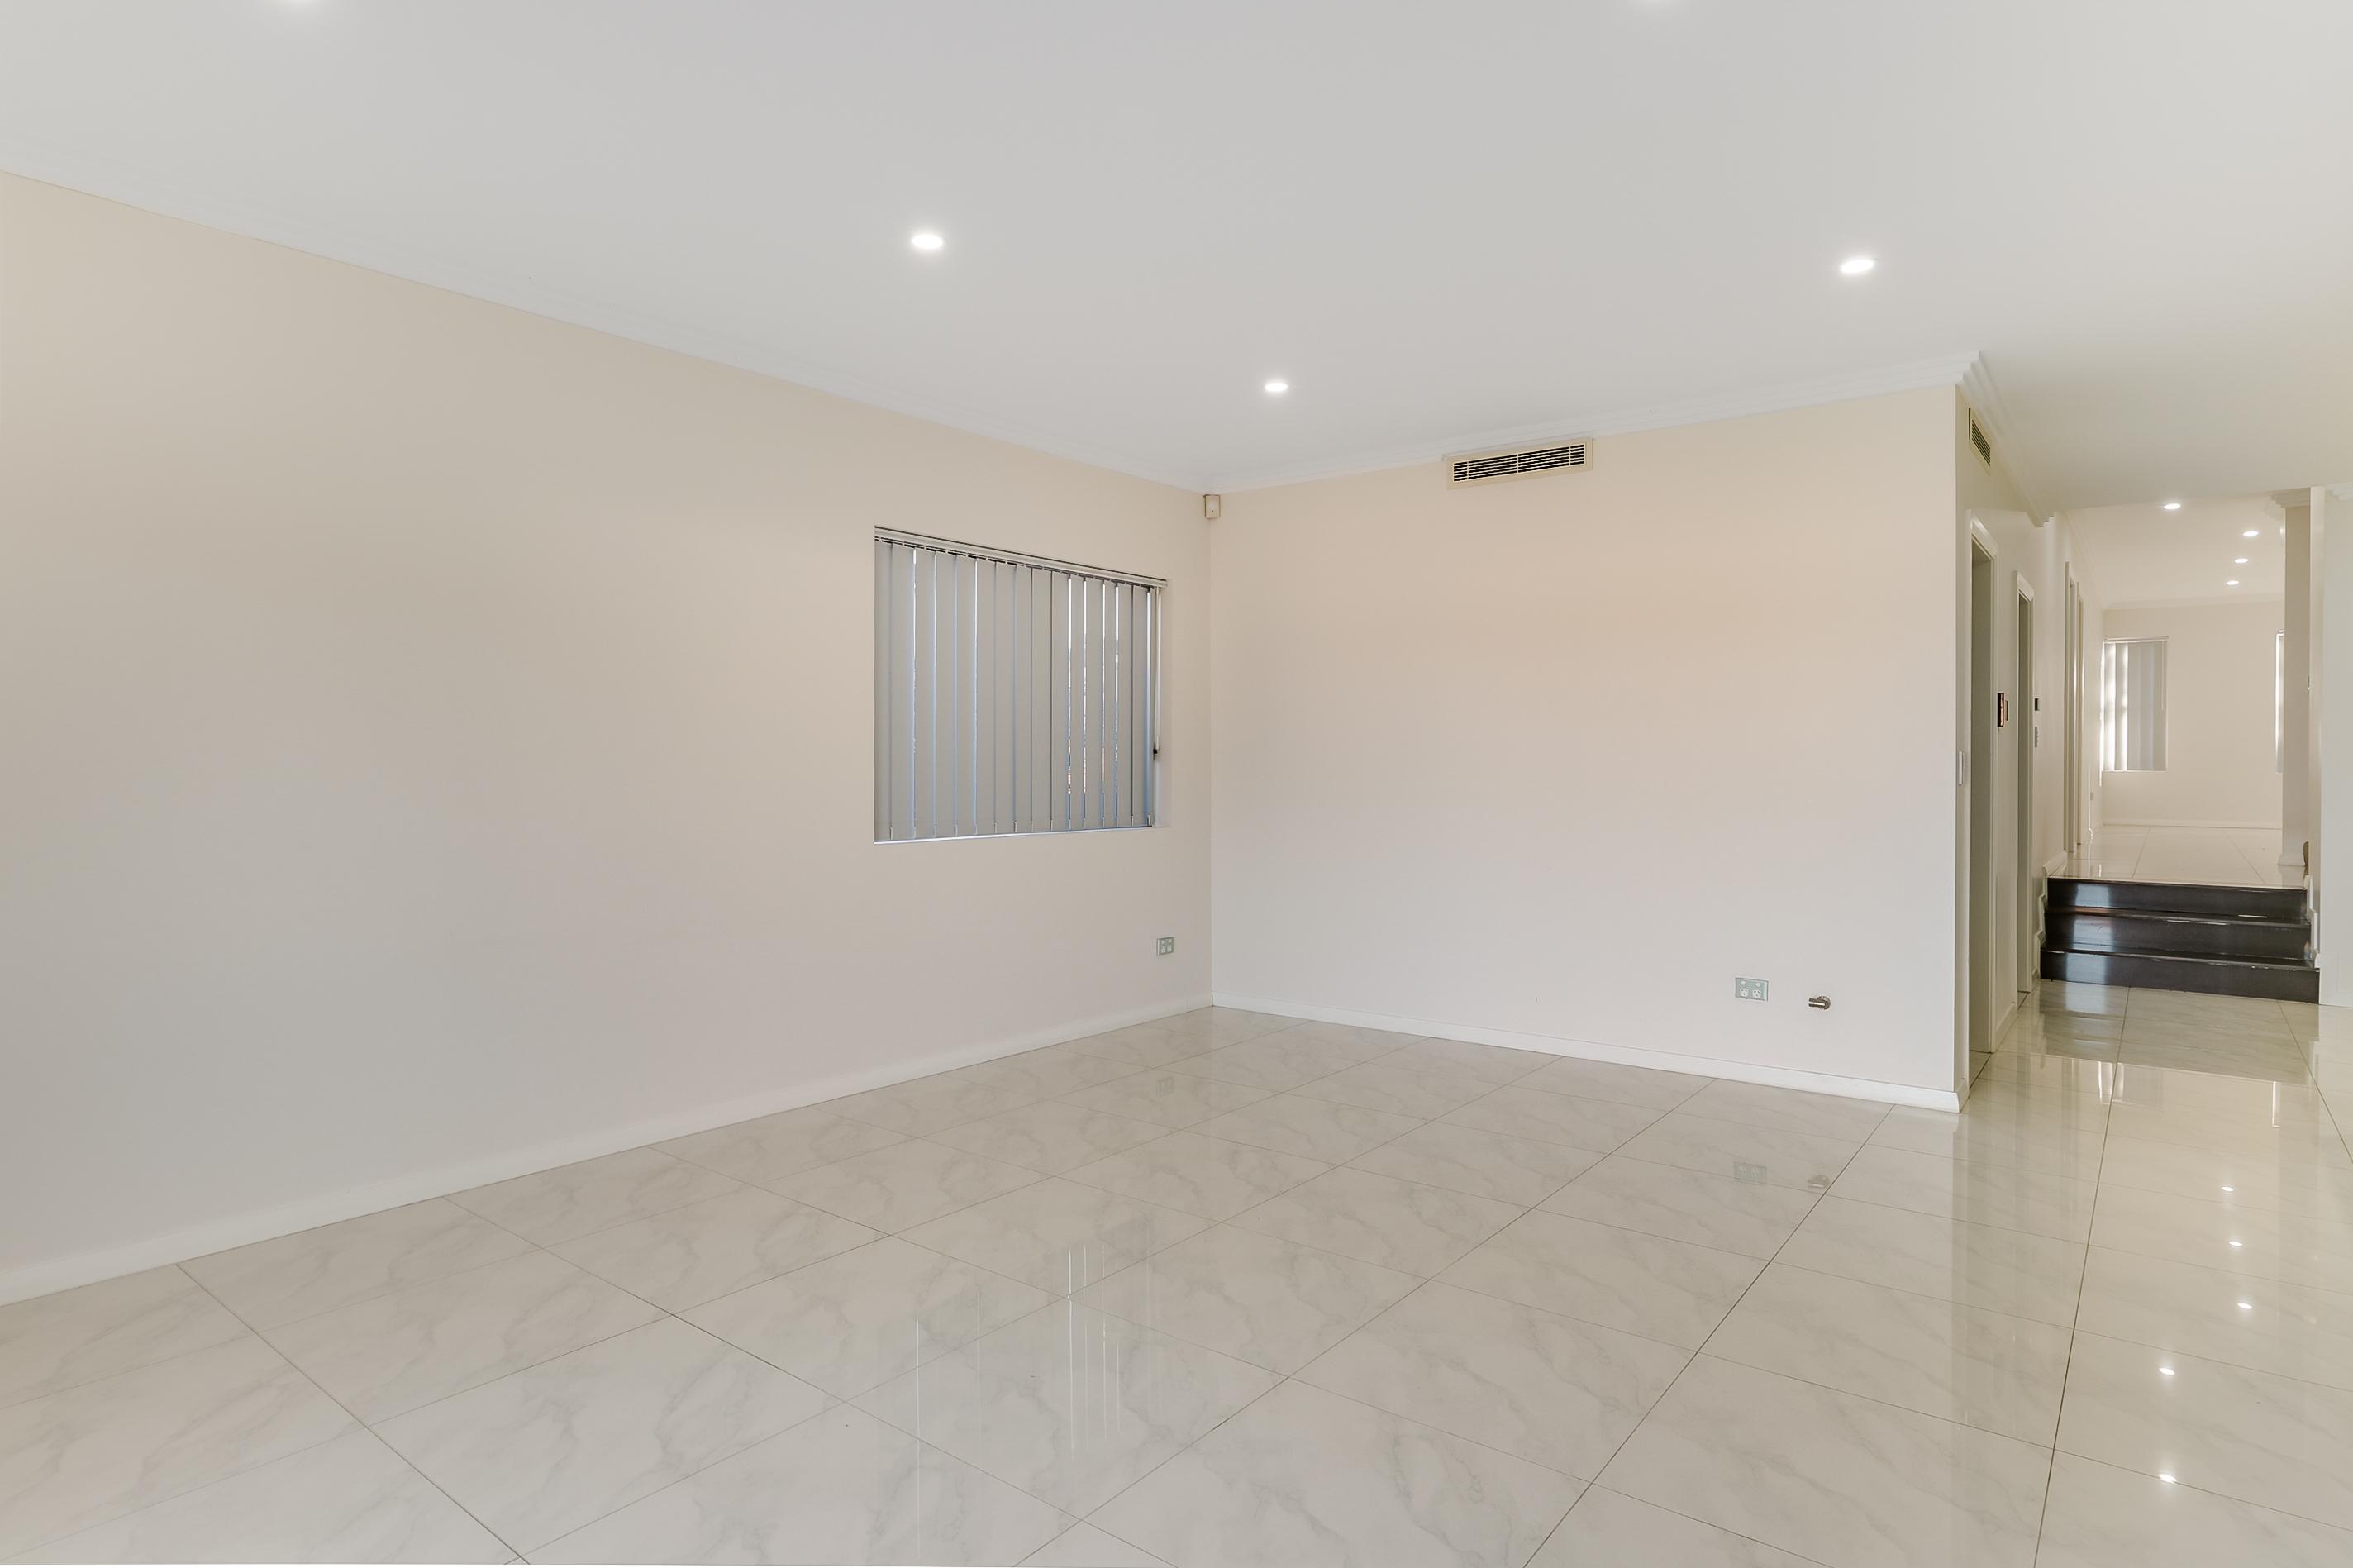 54 scott linging room